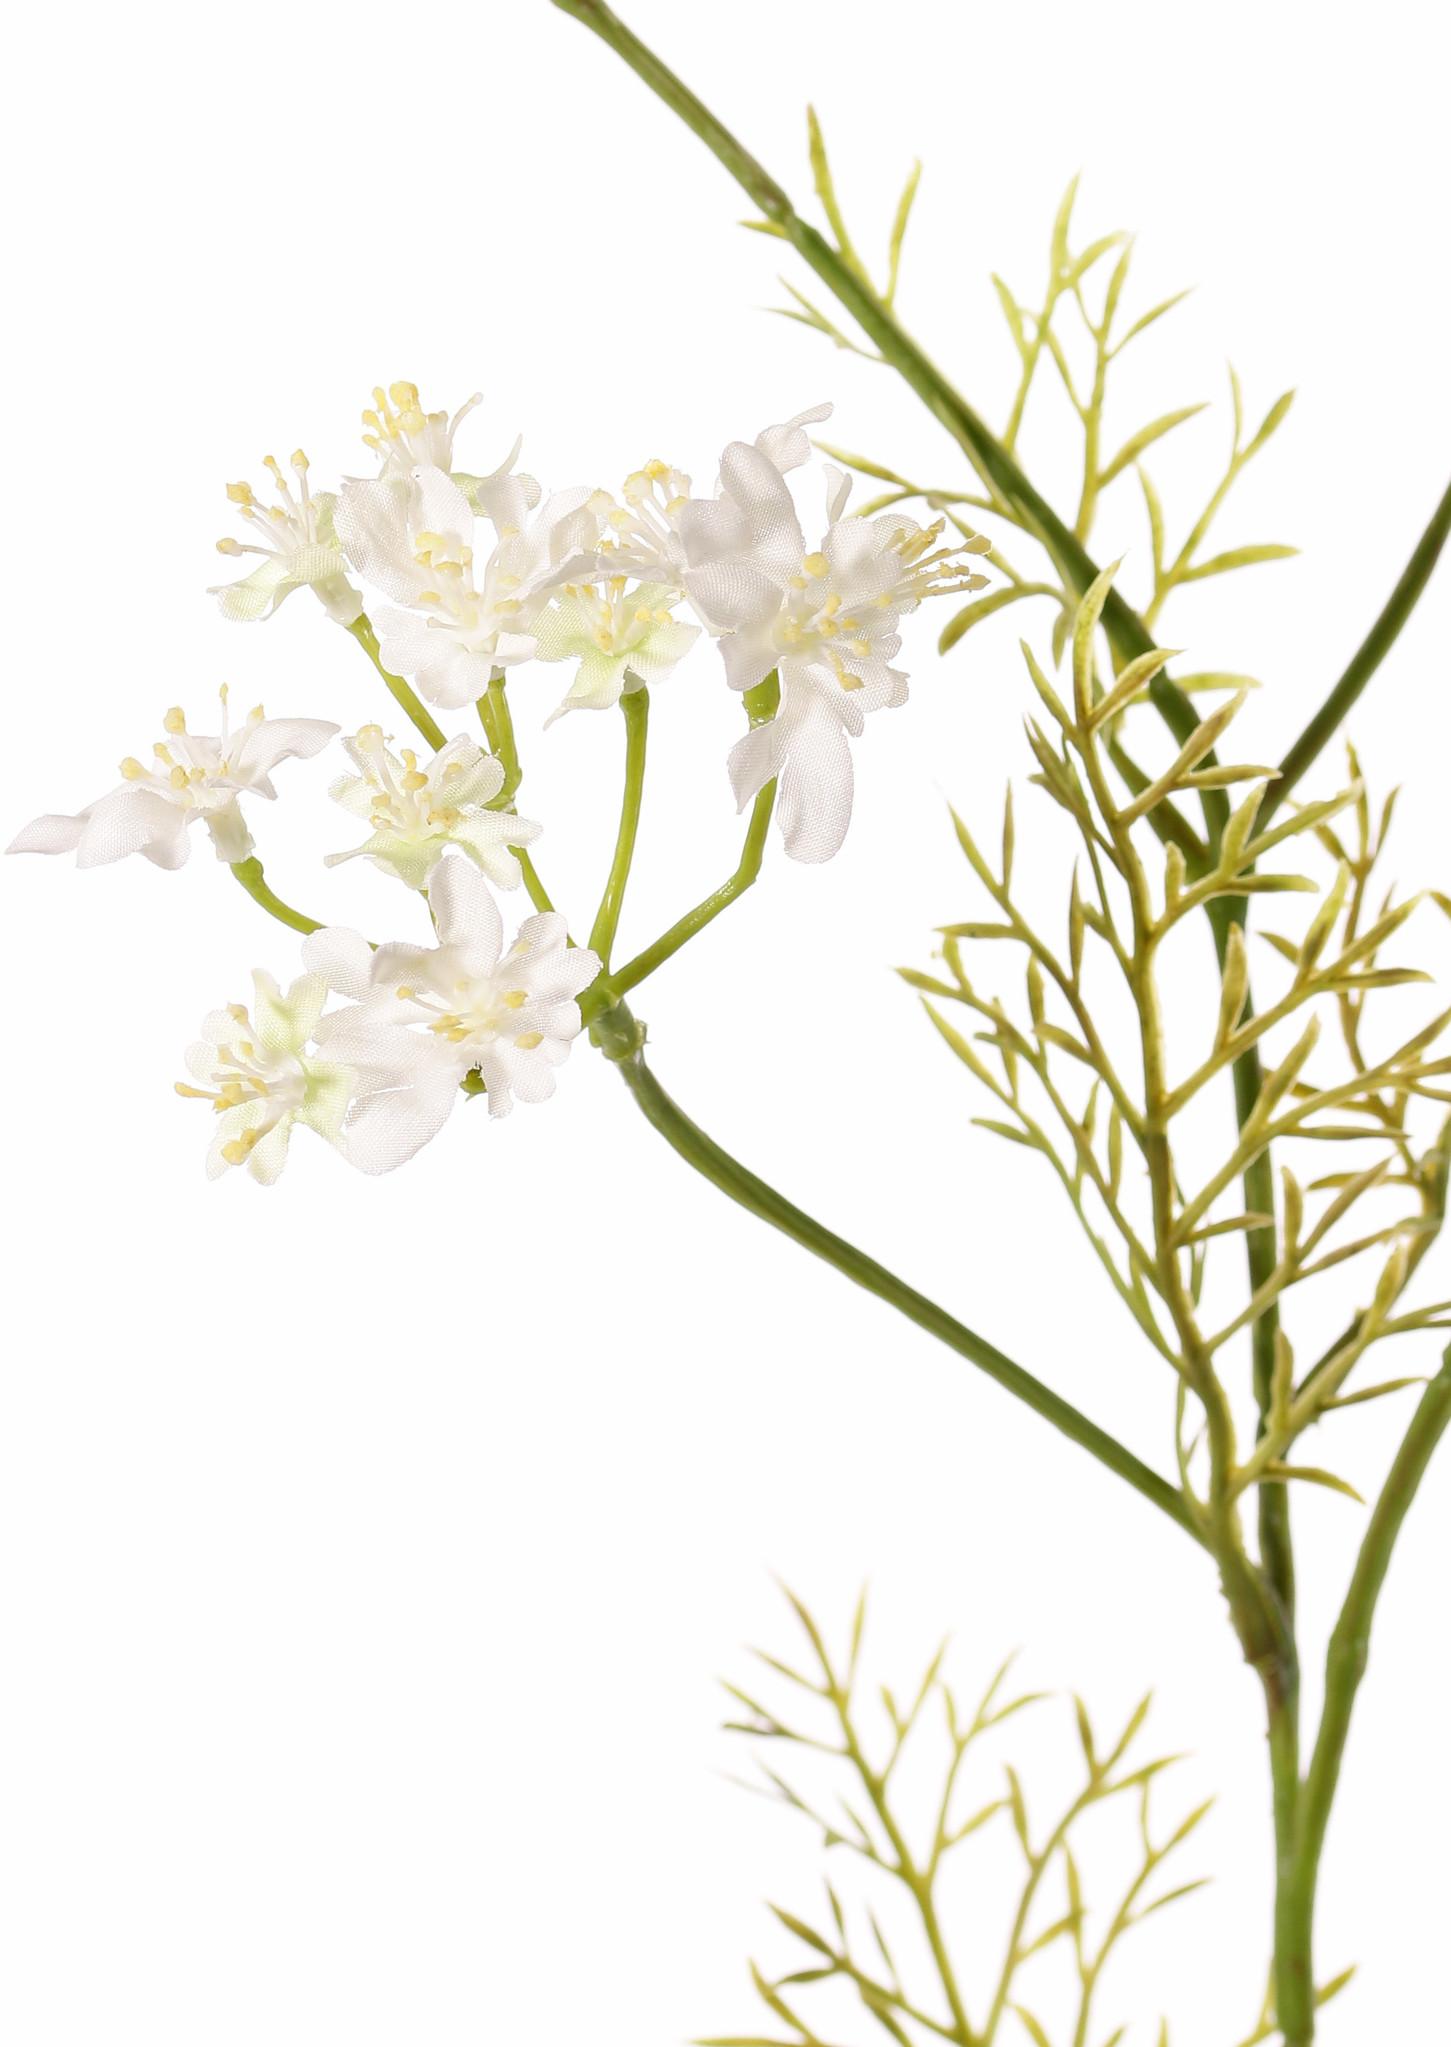 Daucus carota (Wild carrot) 4 branches, 4 umbels (49 flowers) & 6 leaves, 85 cm